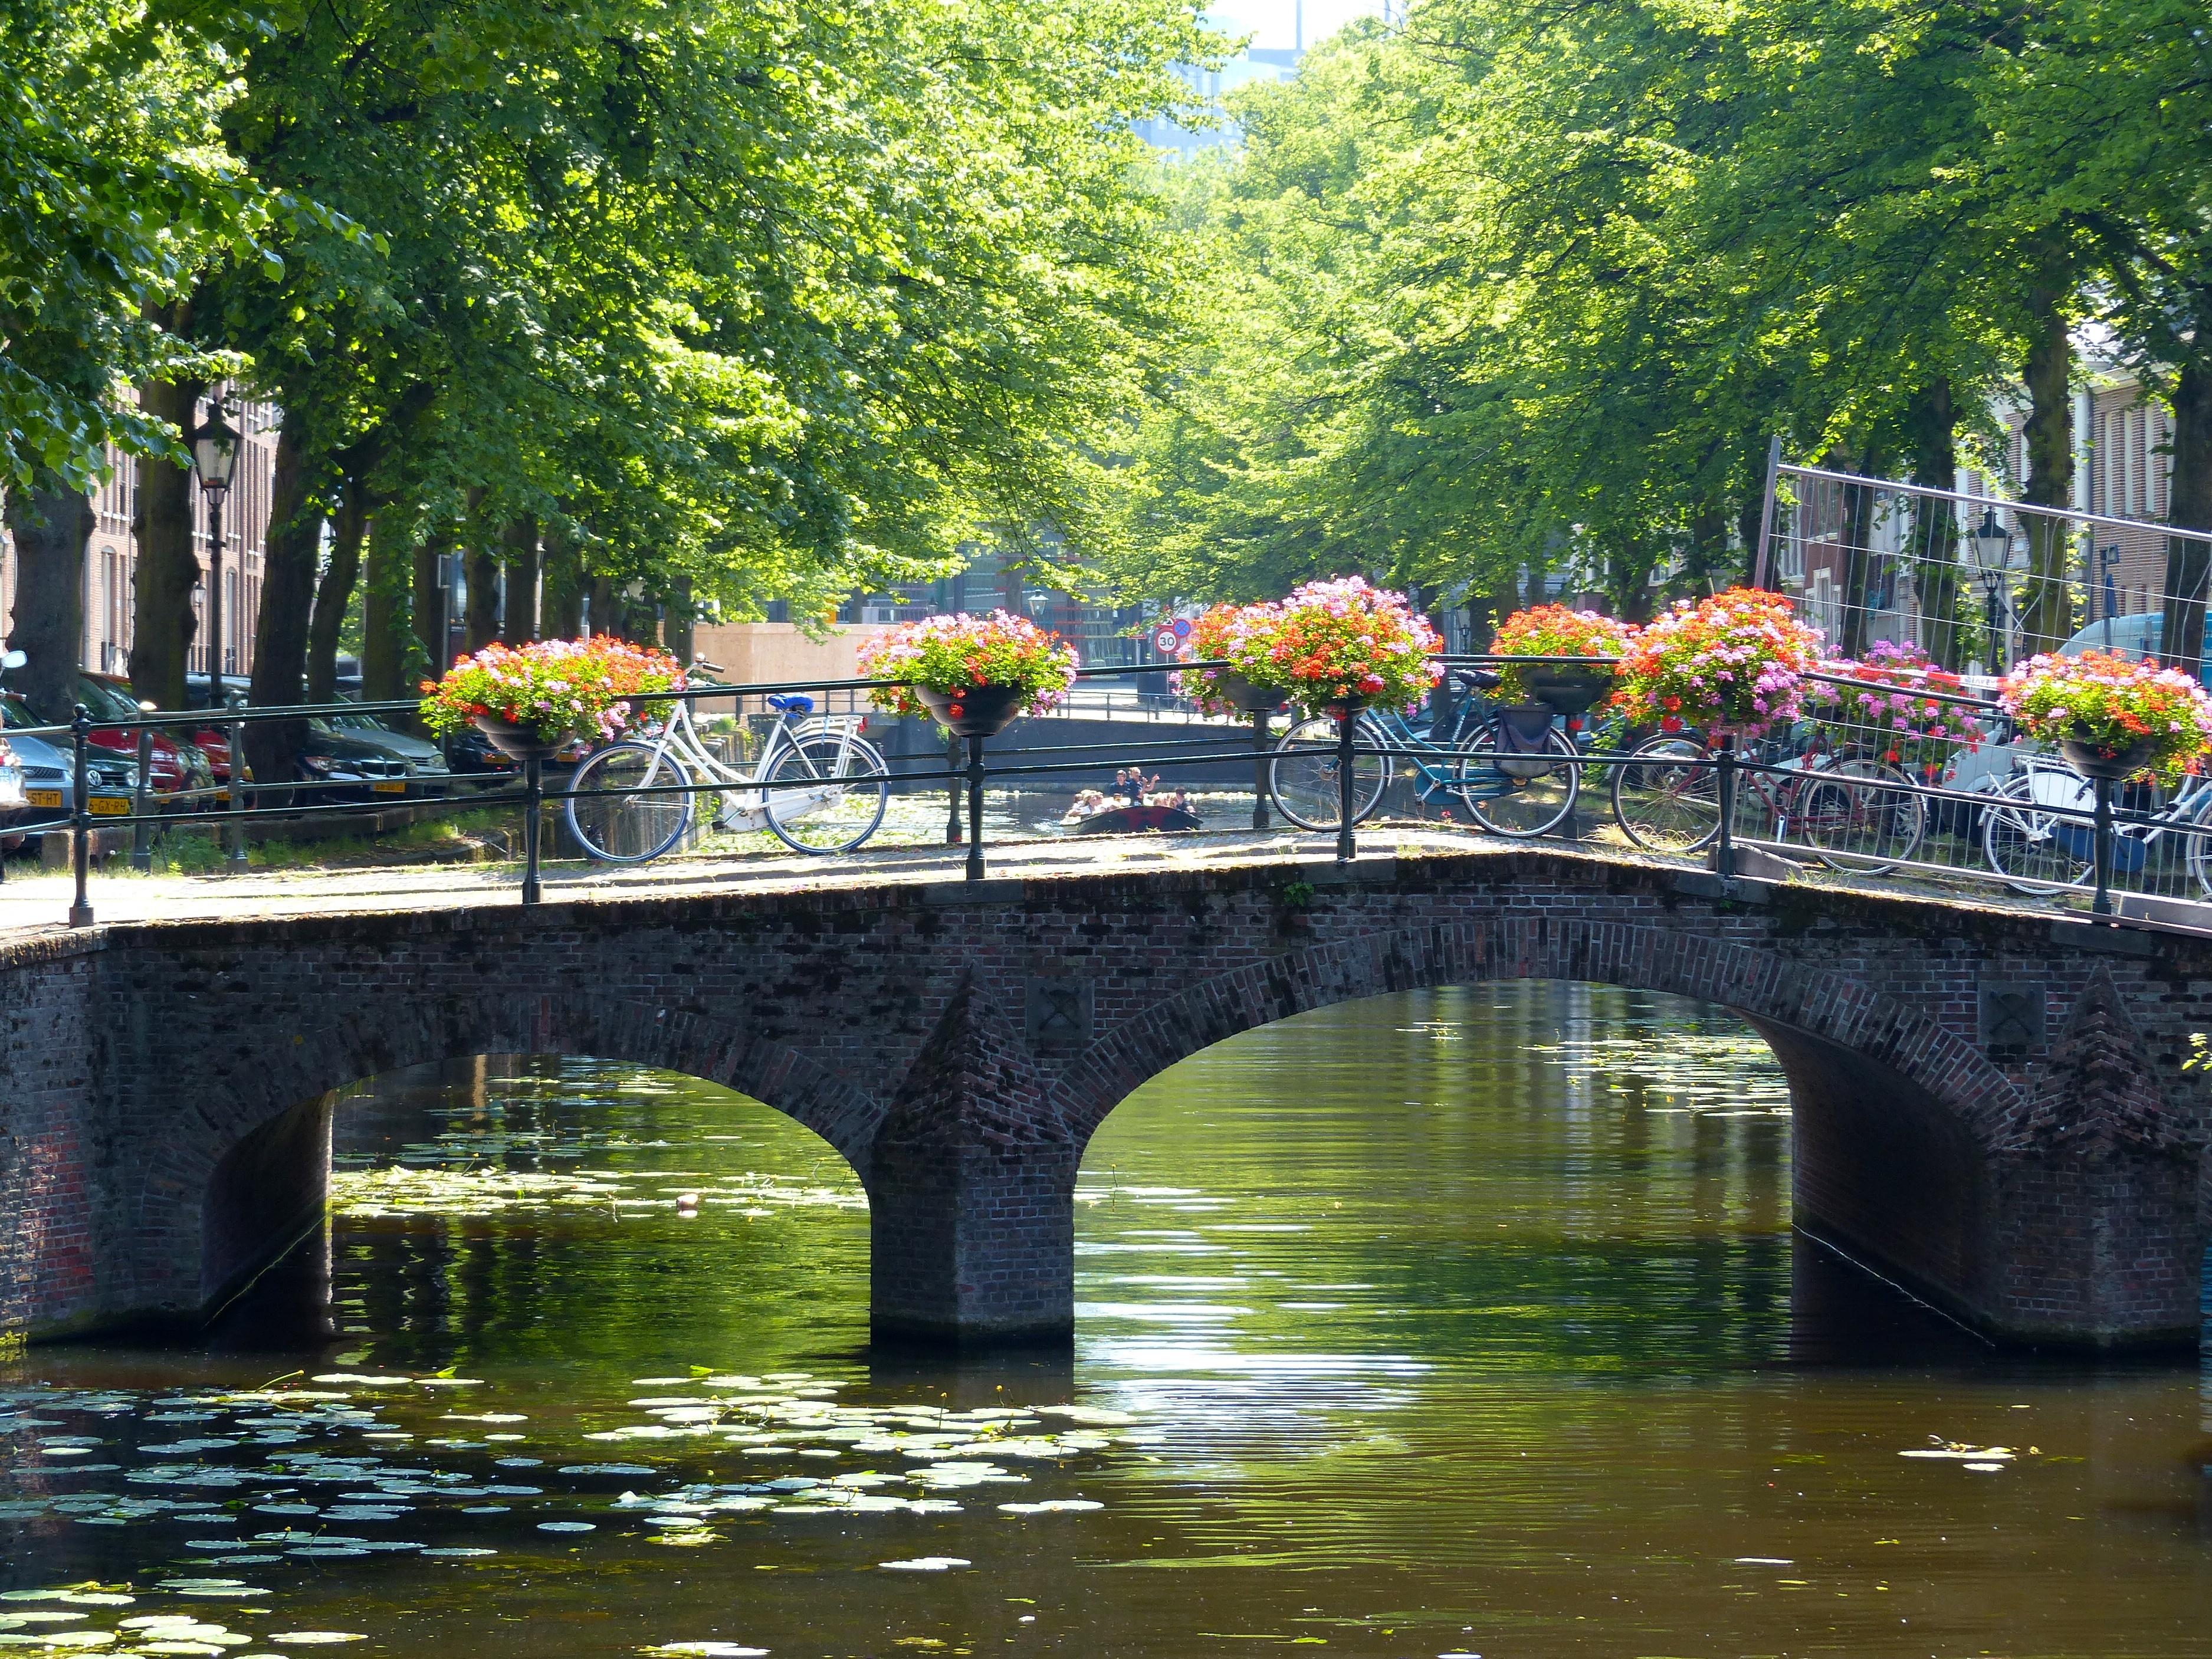 Fotos gratis rbol agua puente flor bicicleta r o for Estanque reflectante